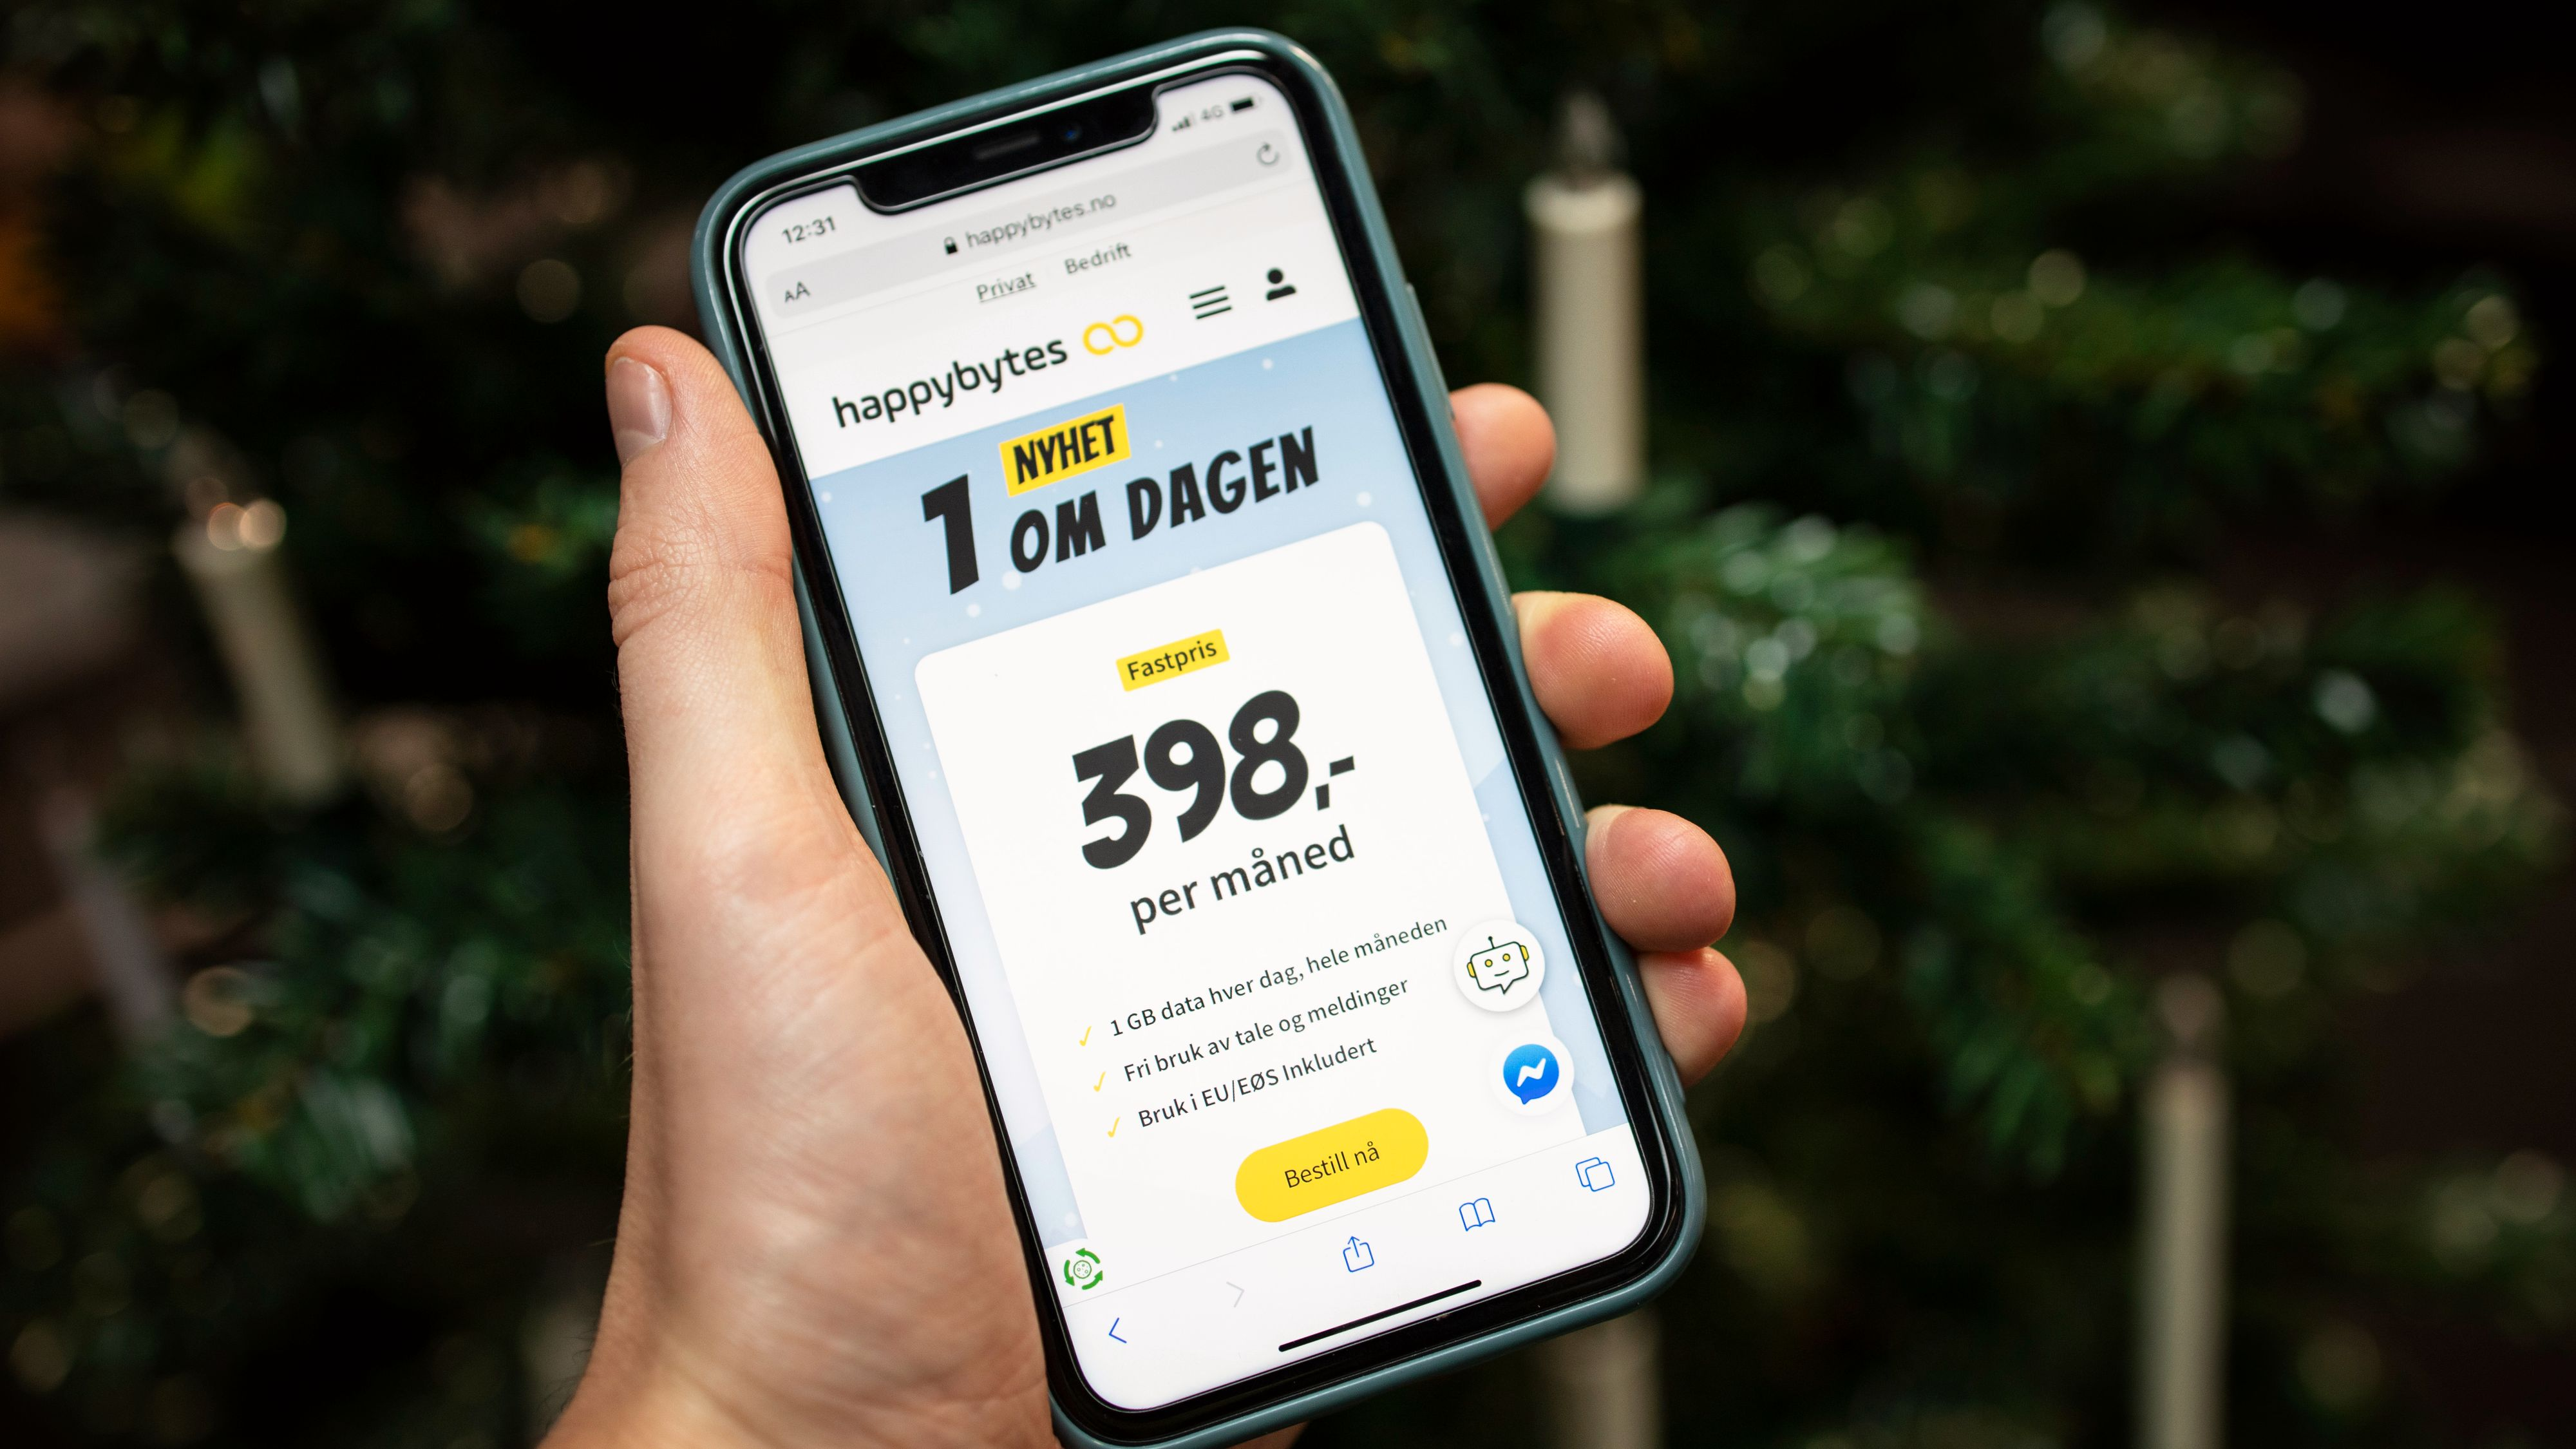 Happybytes prøver ny abonnementsmodell: Tilbyr 1 GB til 13 kroner dagen